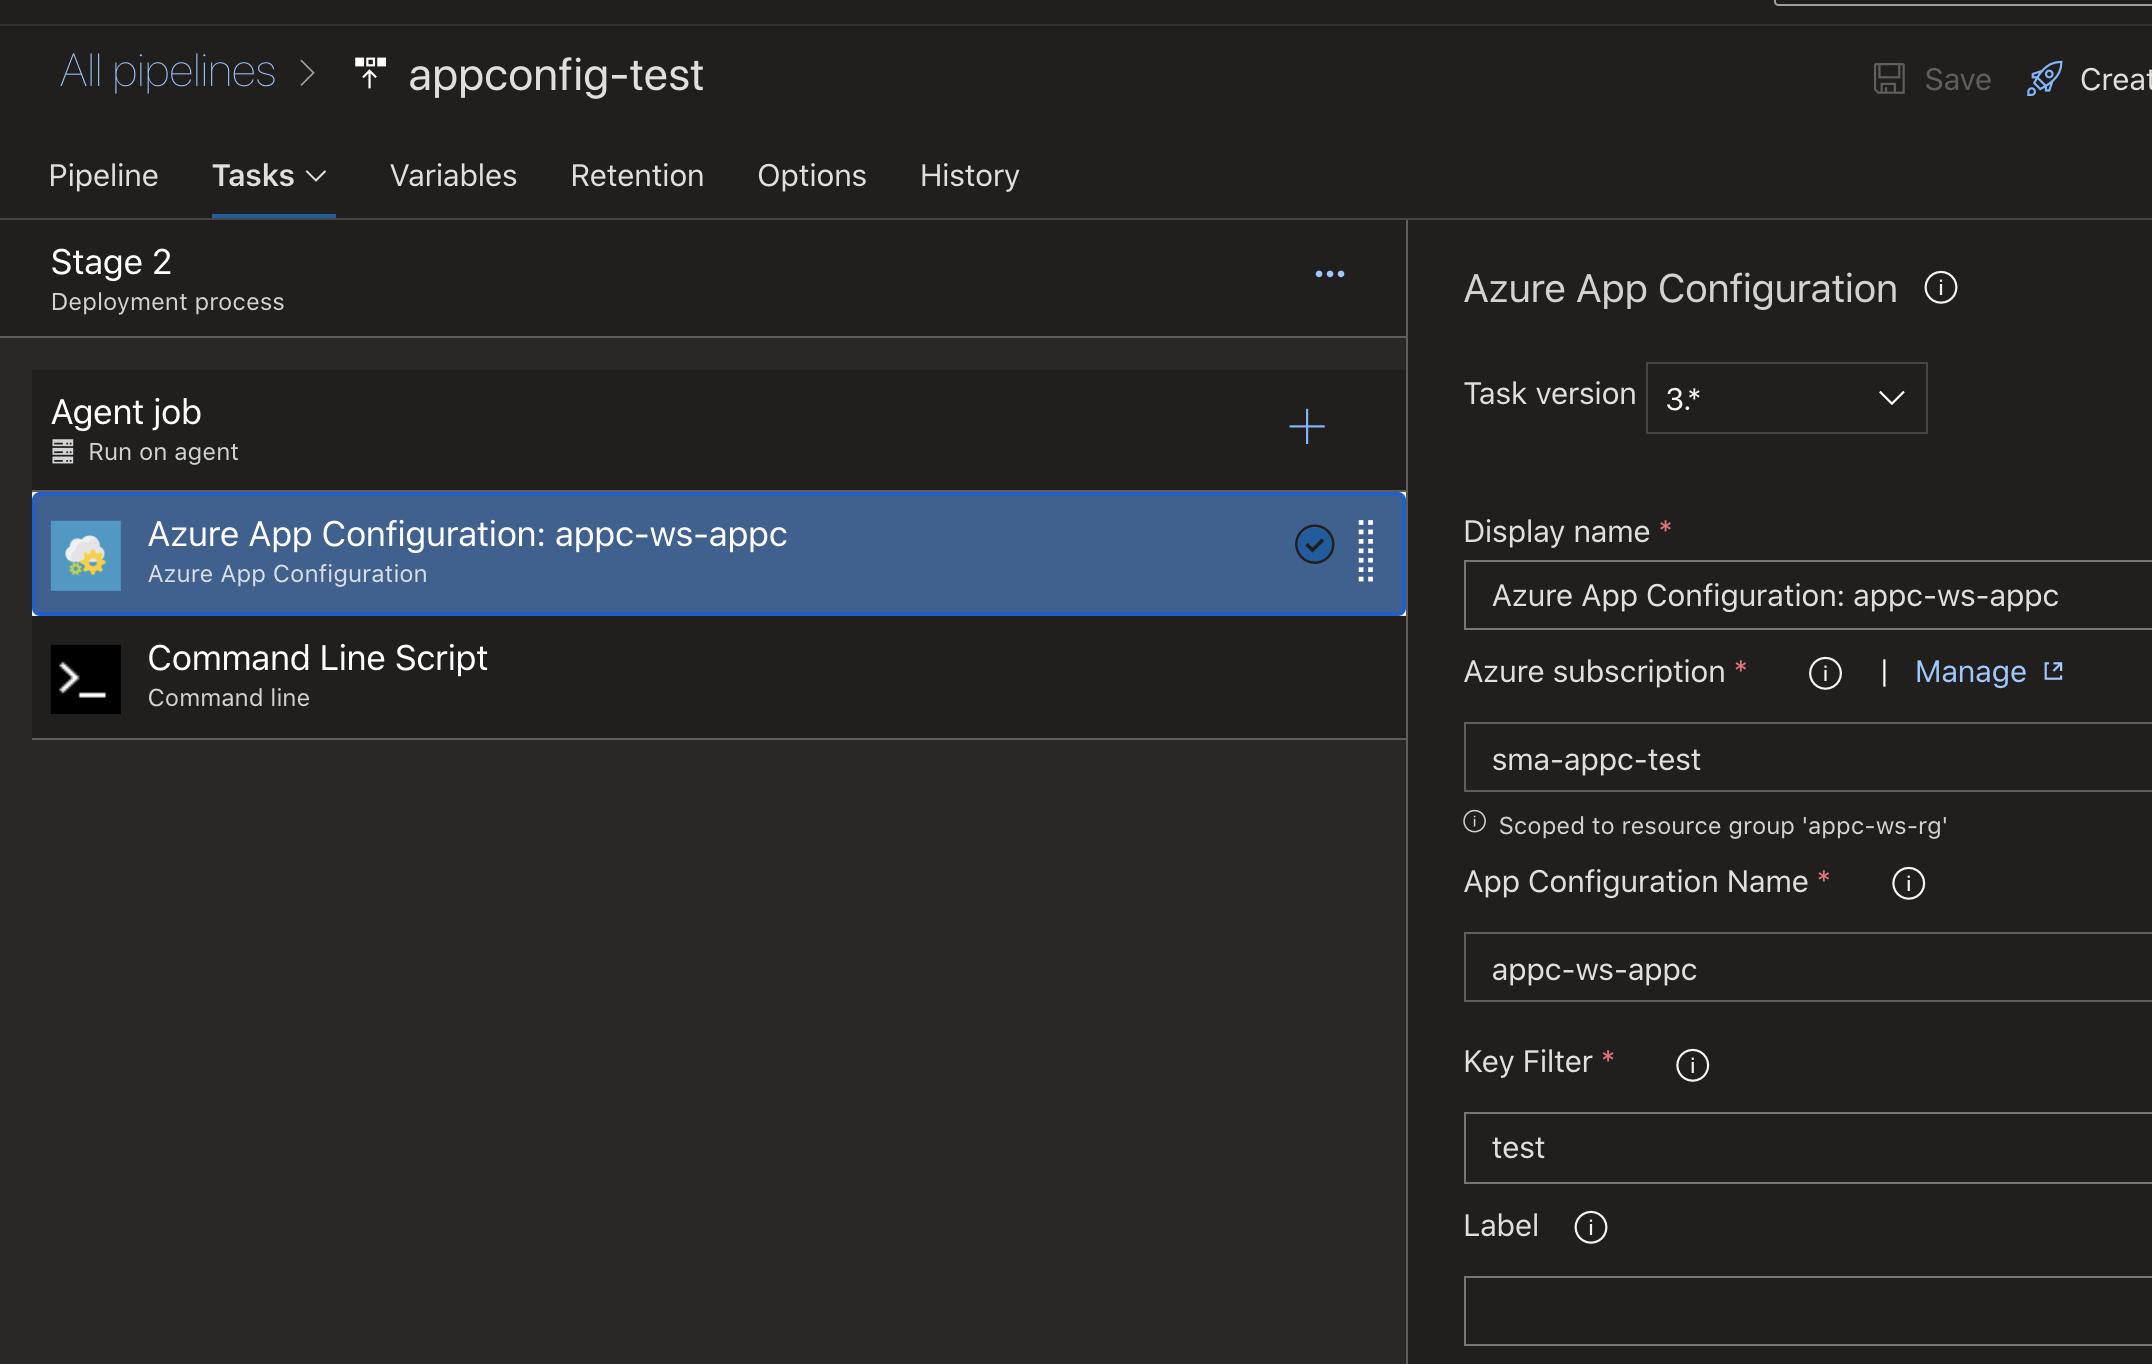 Configuring Azure App Configuration task in Azure DevOps